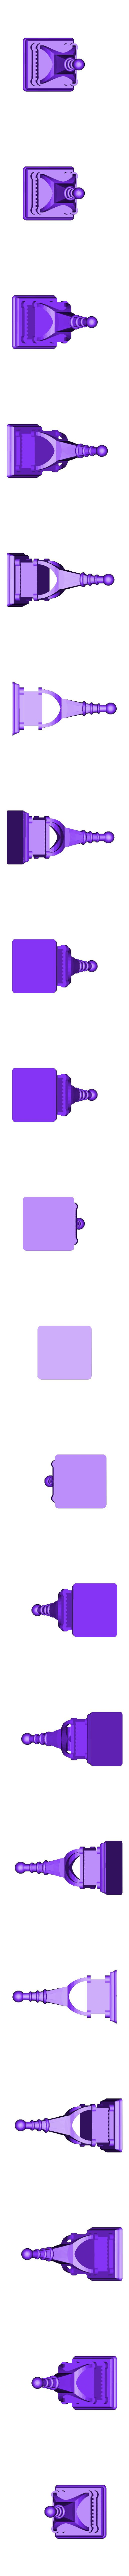 EiffelTower_part_A.stl Download free STL file Eiffel Tower tricolor • 3D printable object, jteix